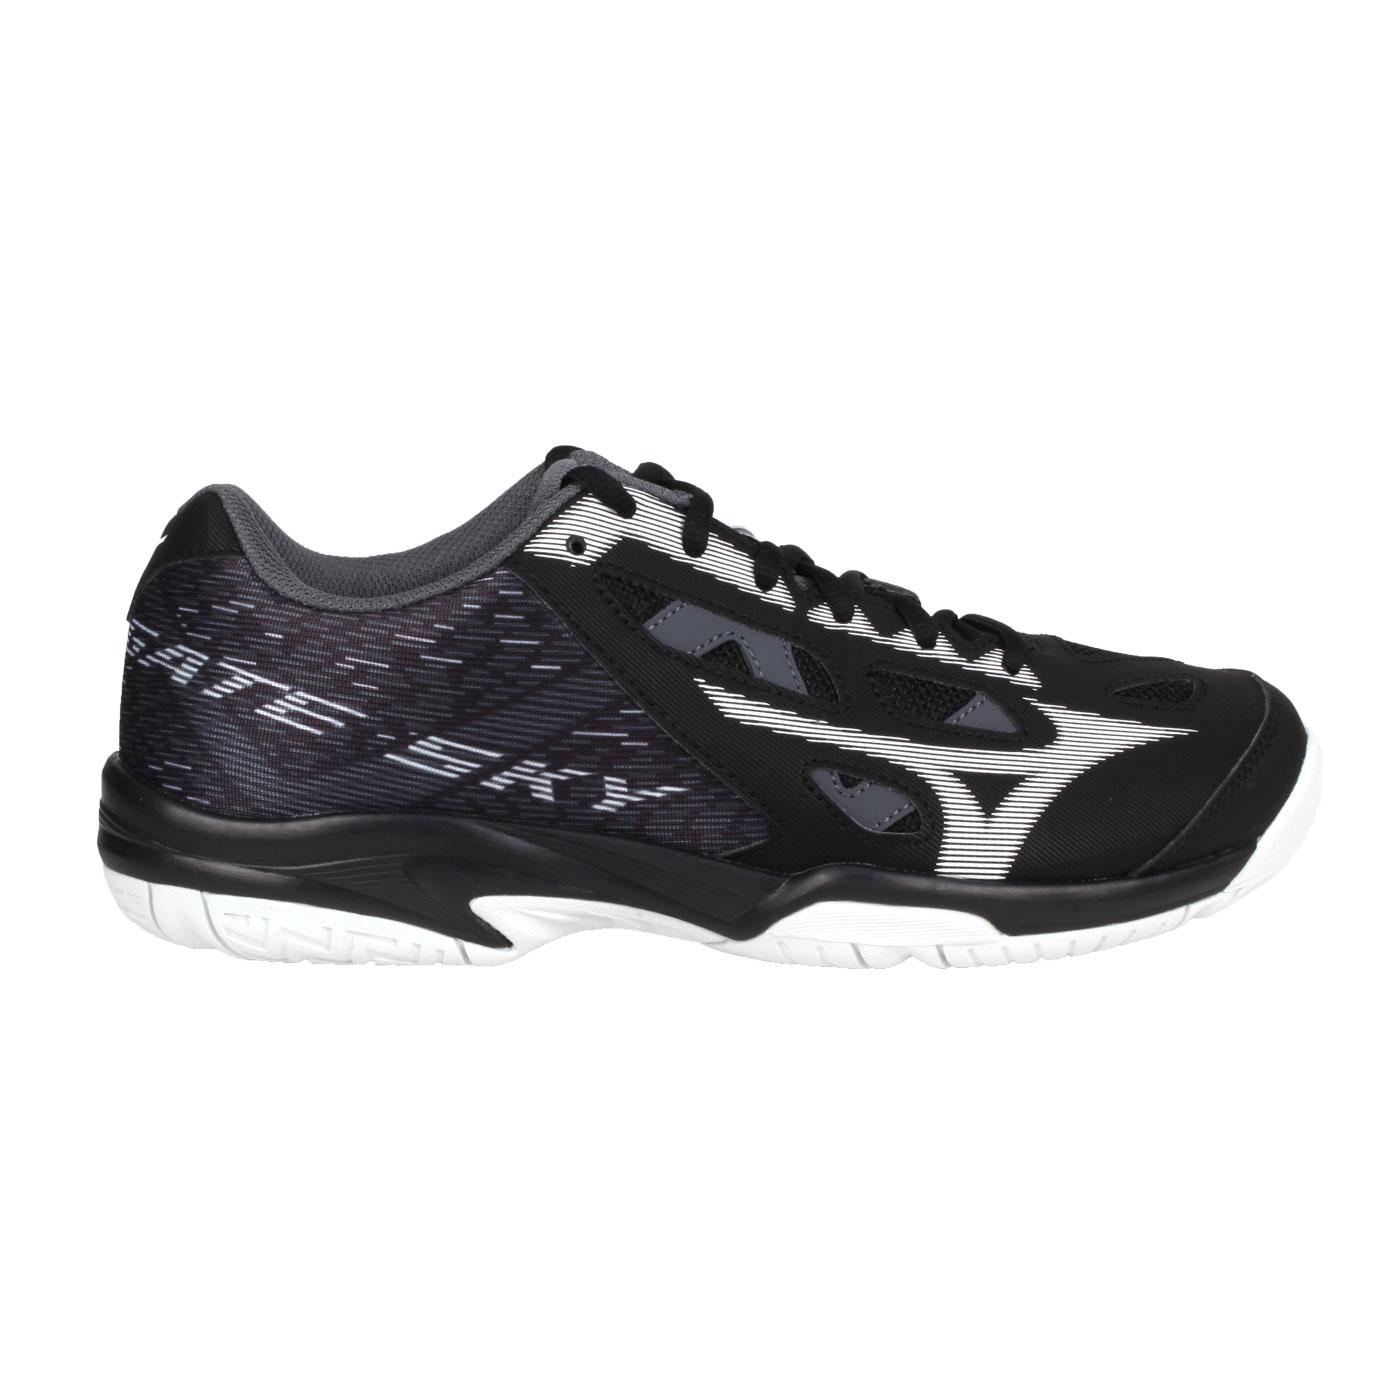 MIZUNO 男款羽球鞋-WIDE  @GATE SKY plus@71GA204009 - 黑白灰